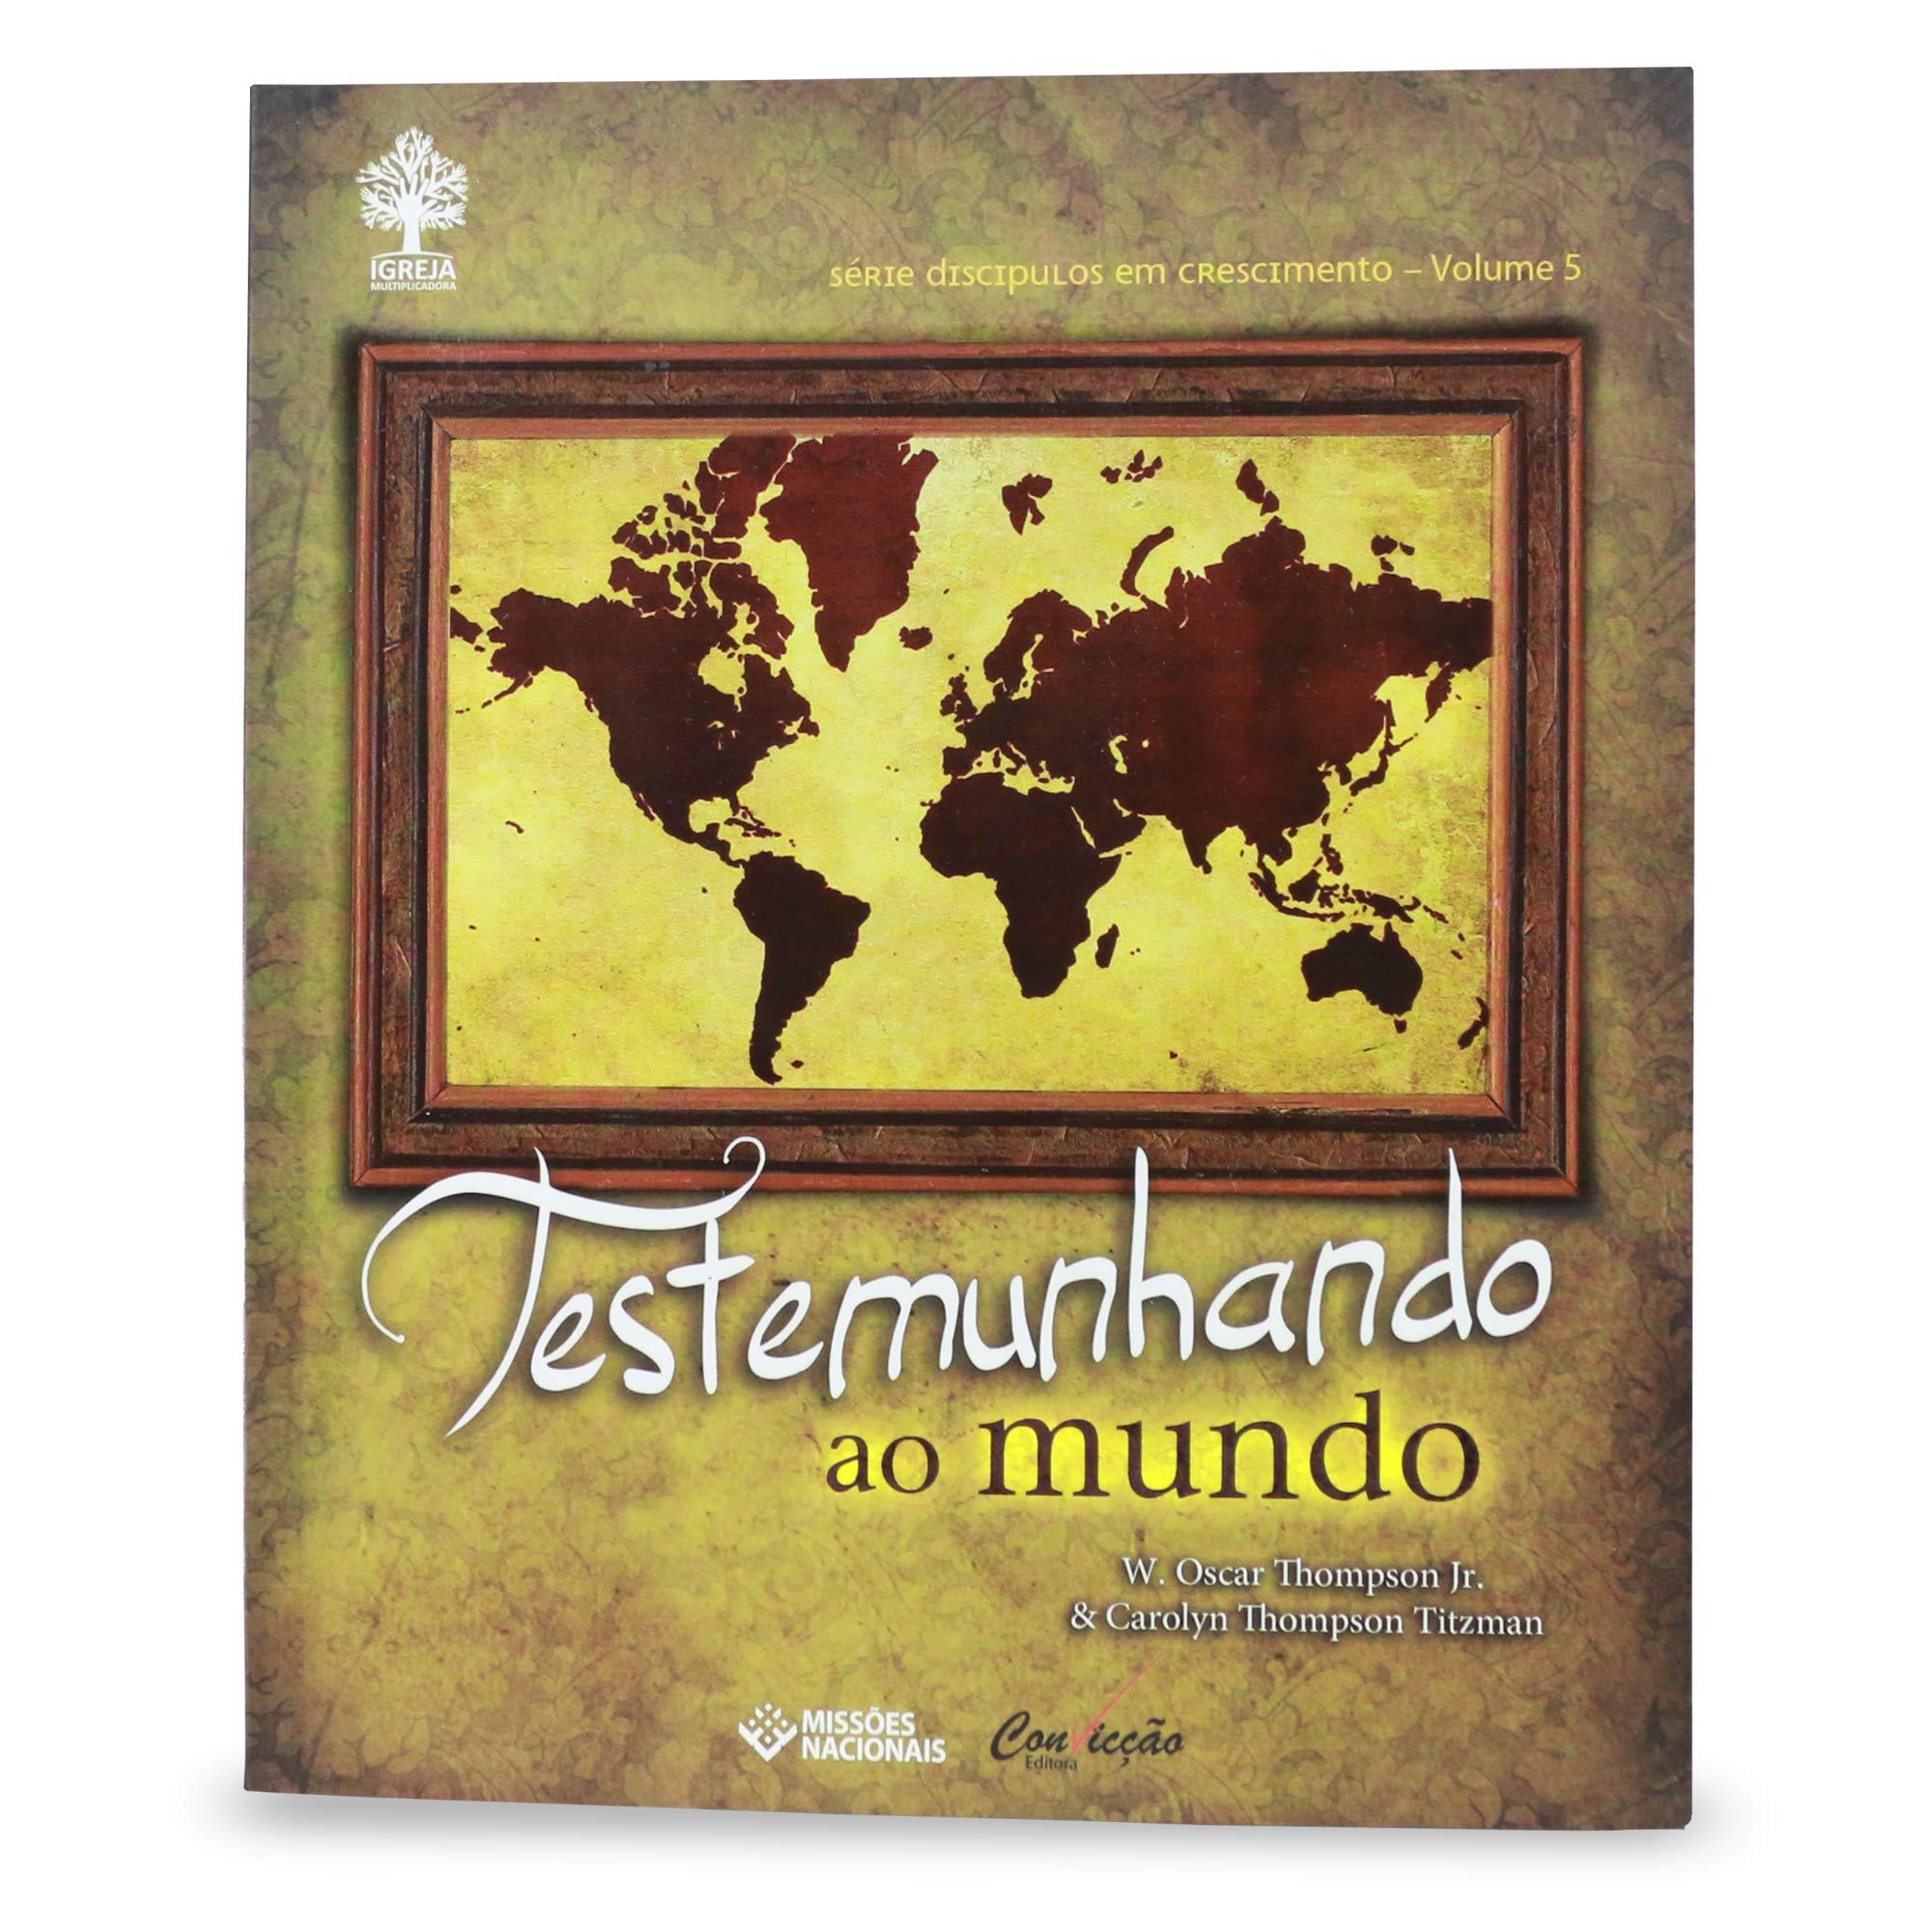 Testemunhando ao mundo, Livro